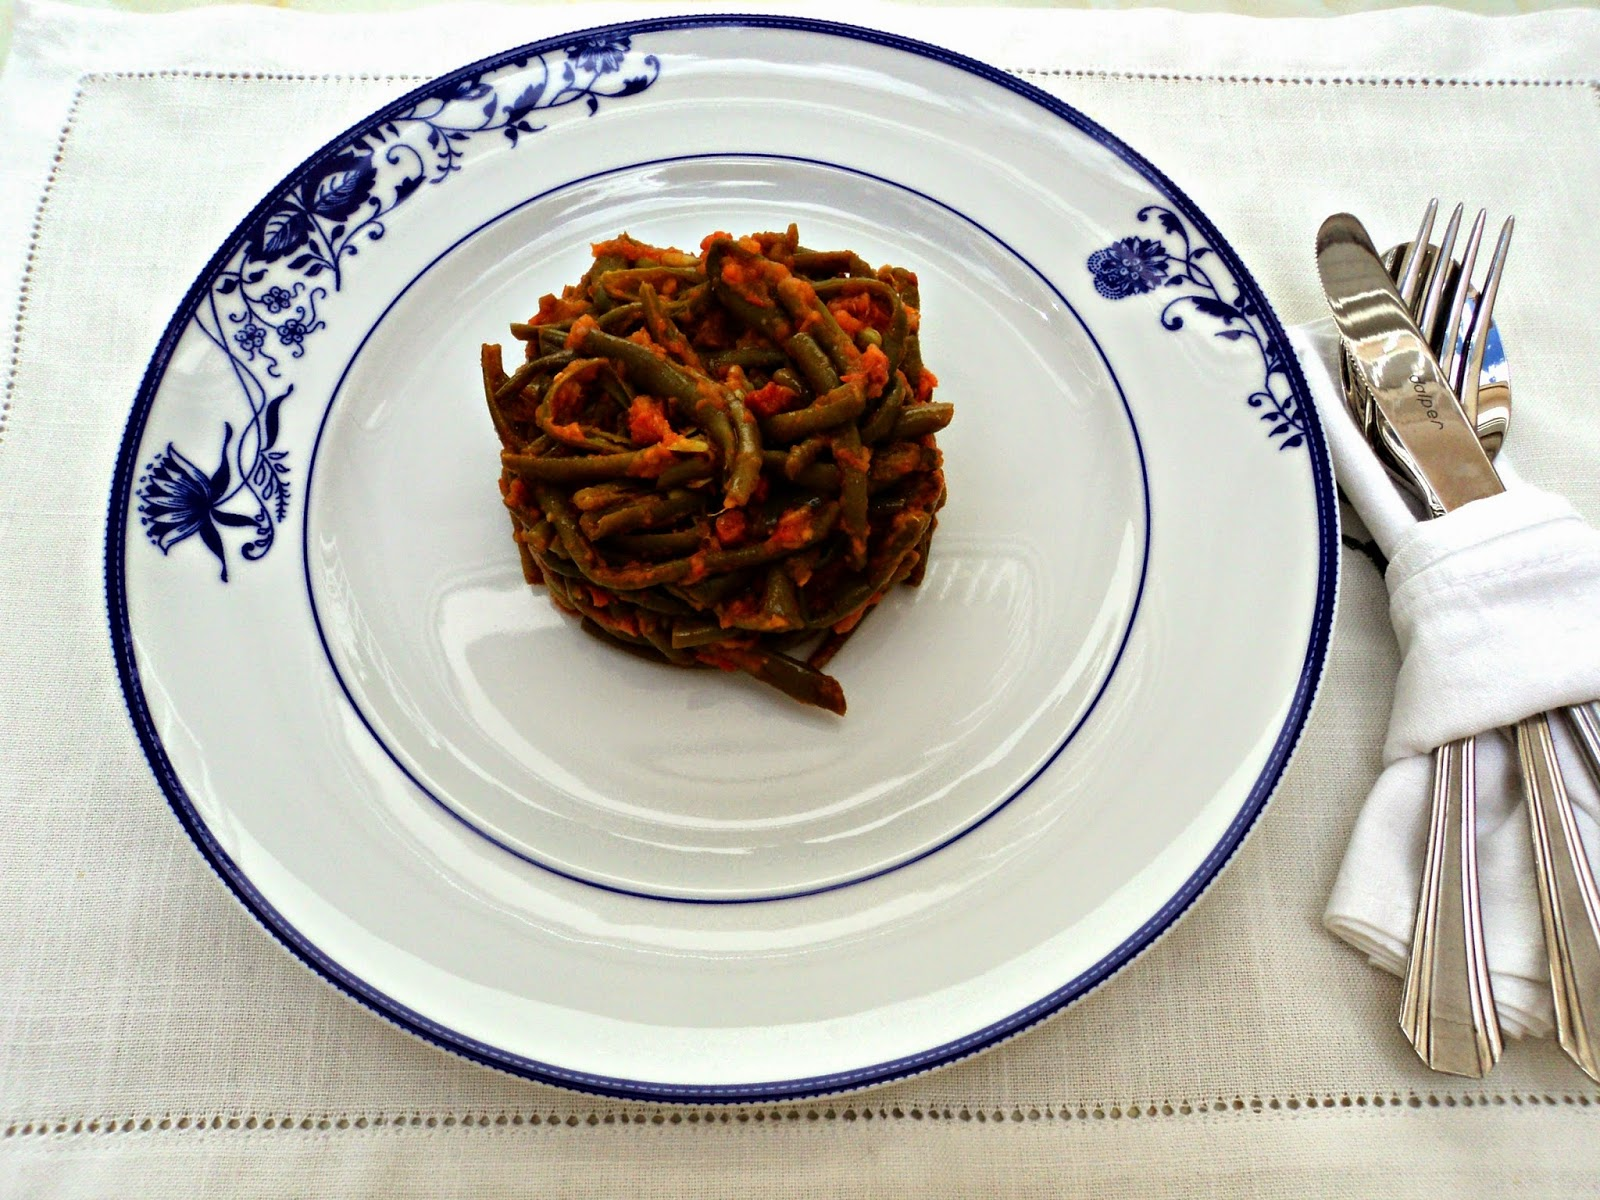 ensalada-judias-verdes-tomate-jamon-cubiertos